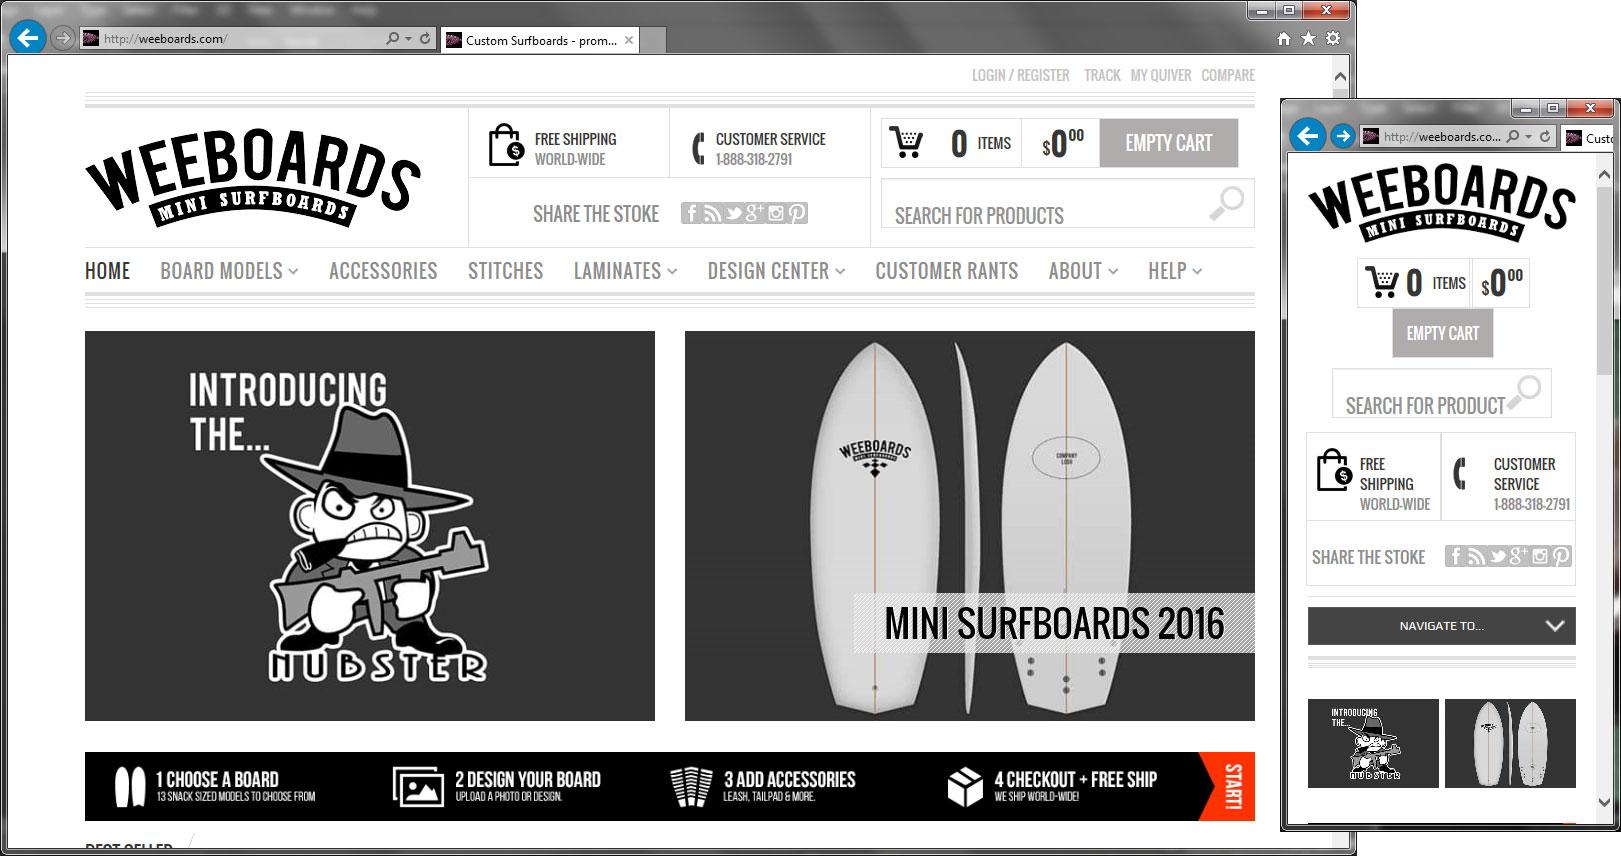 website-design-services-oc40.jpg